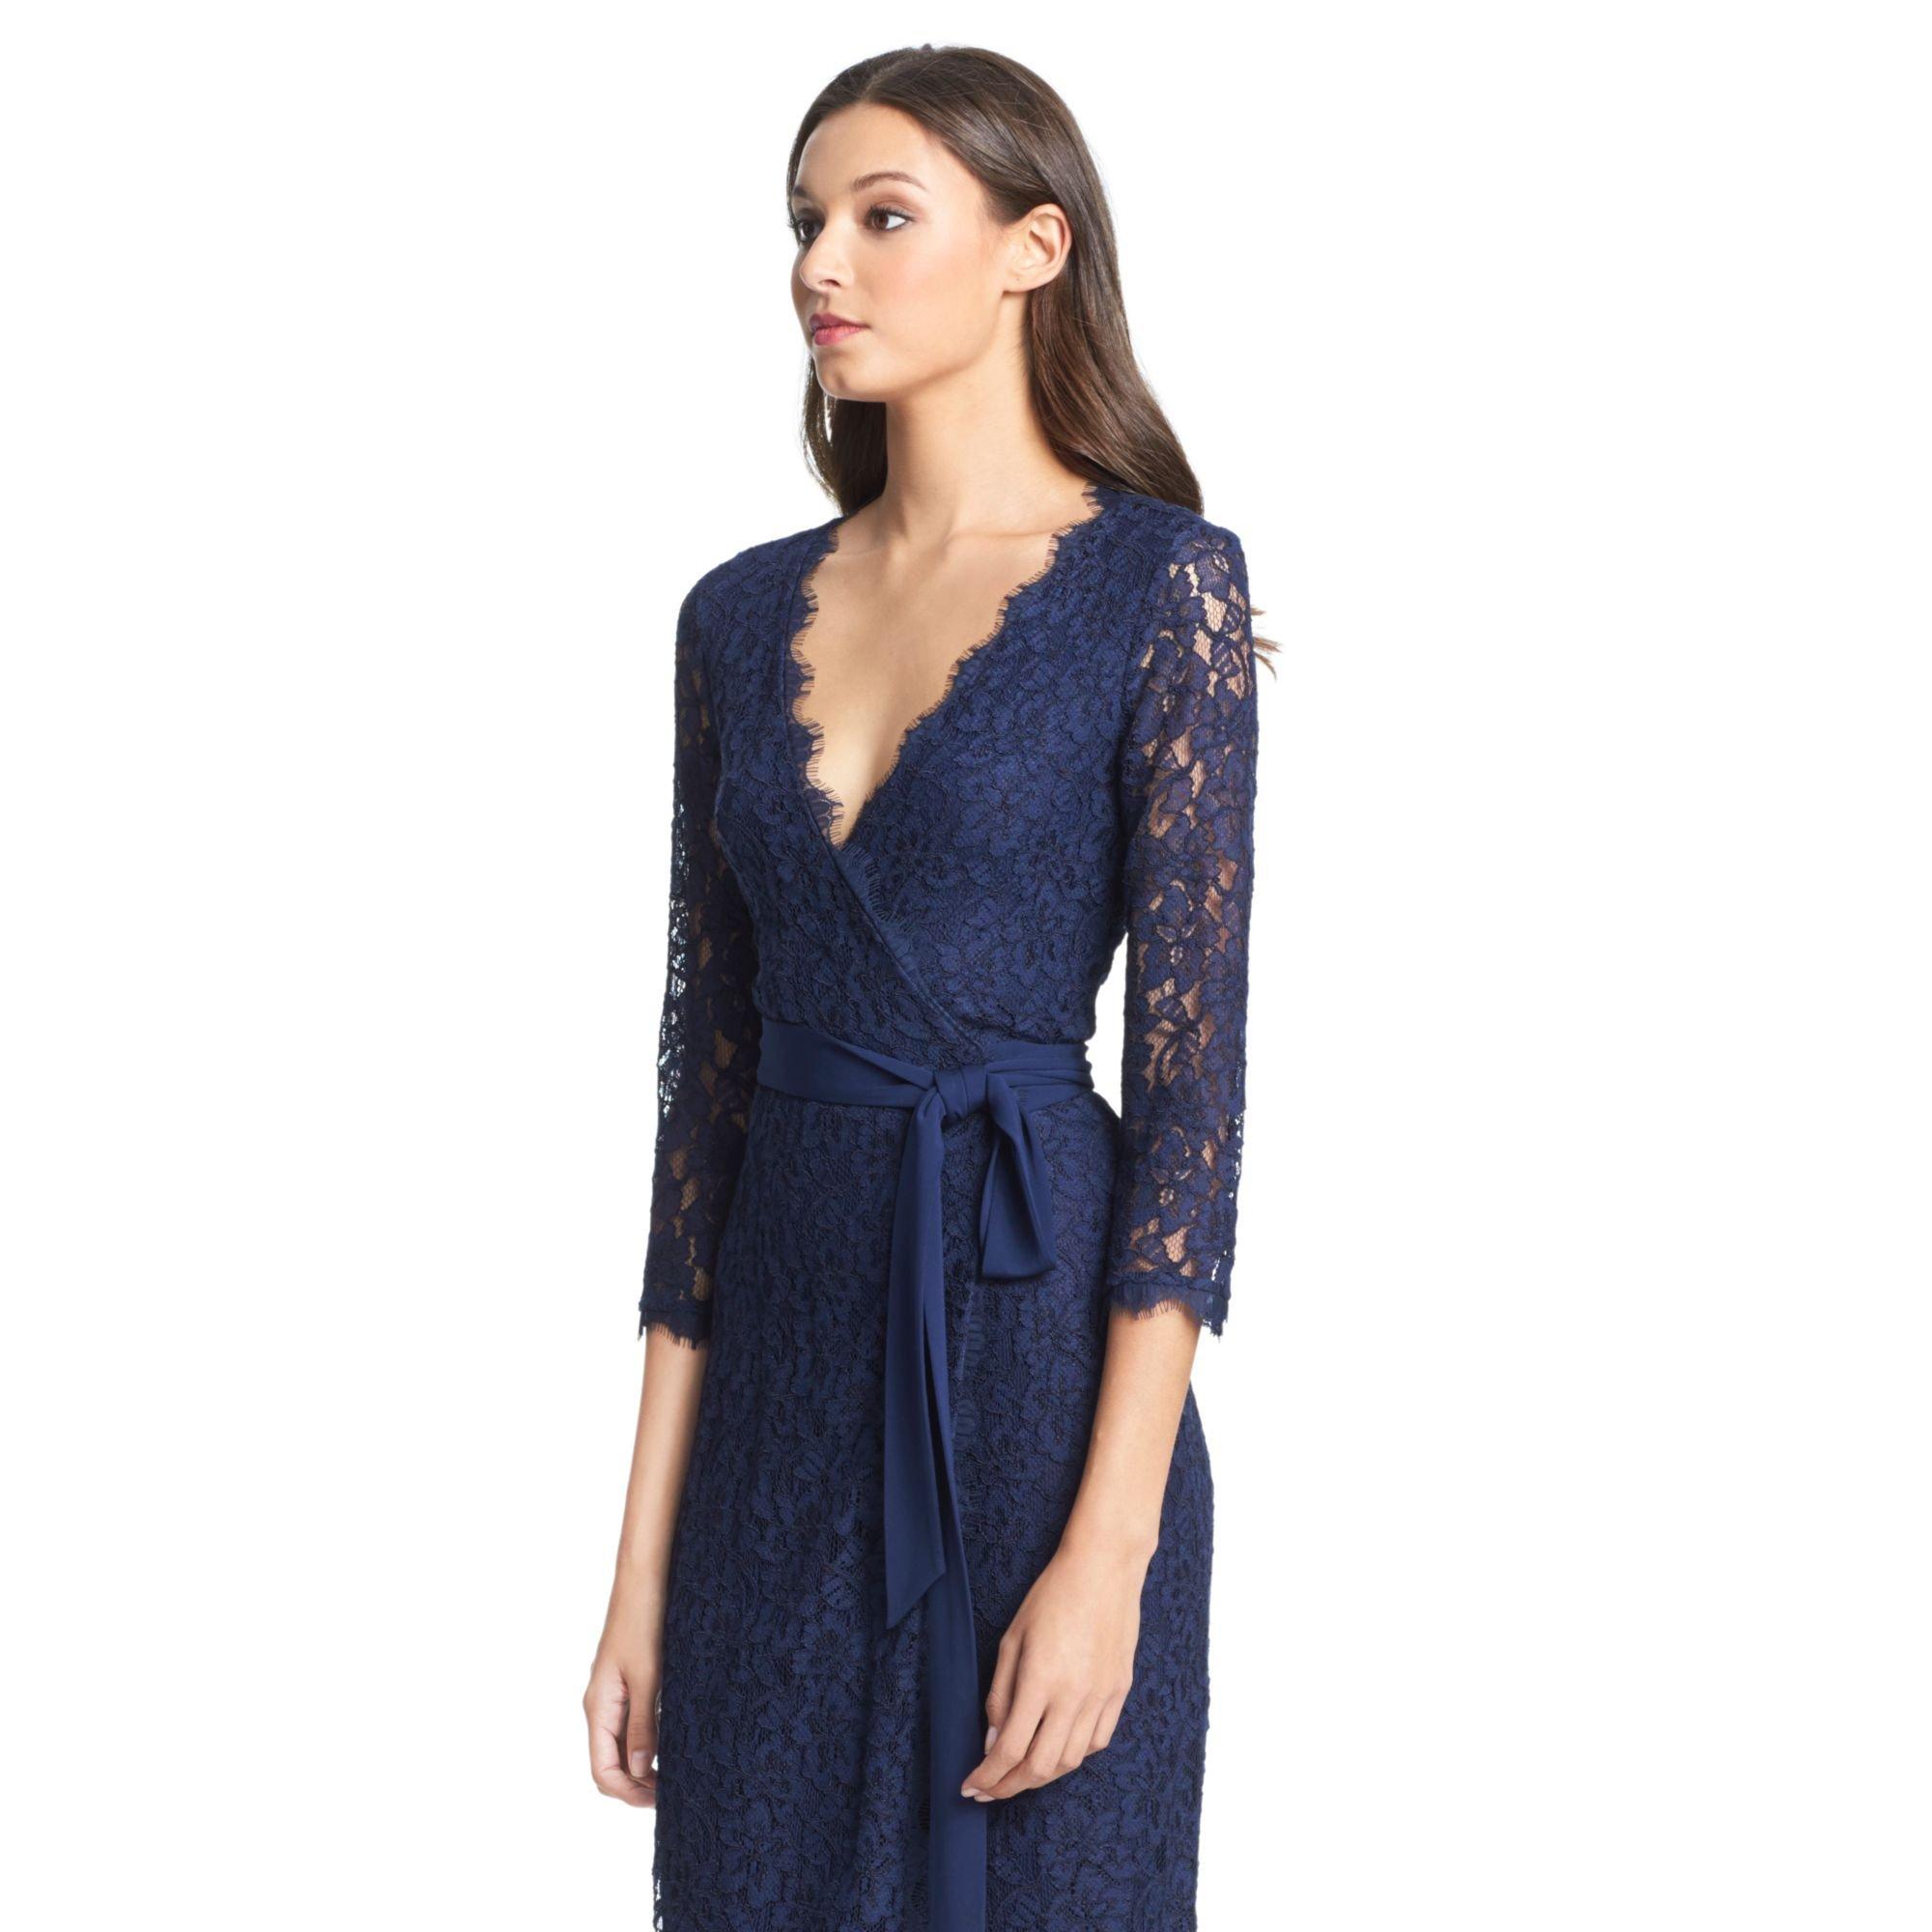 63da06d1a4d51 Diane von Furstenberg Dvf Julianna Lace Wrap Dress in Blue - Lyst